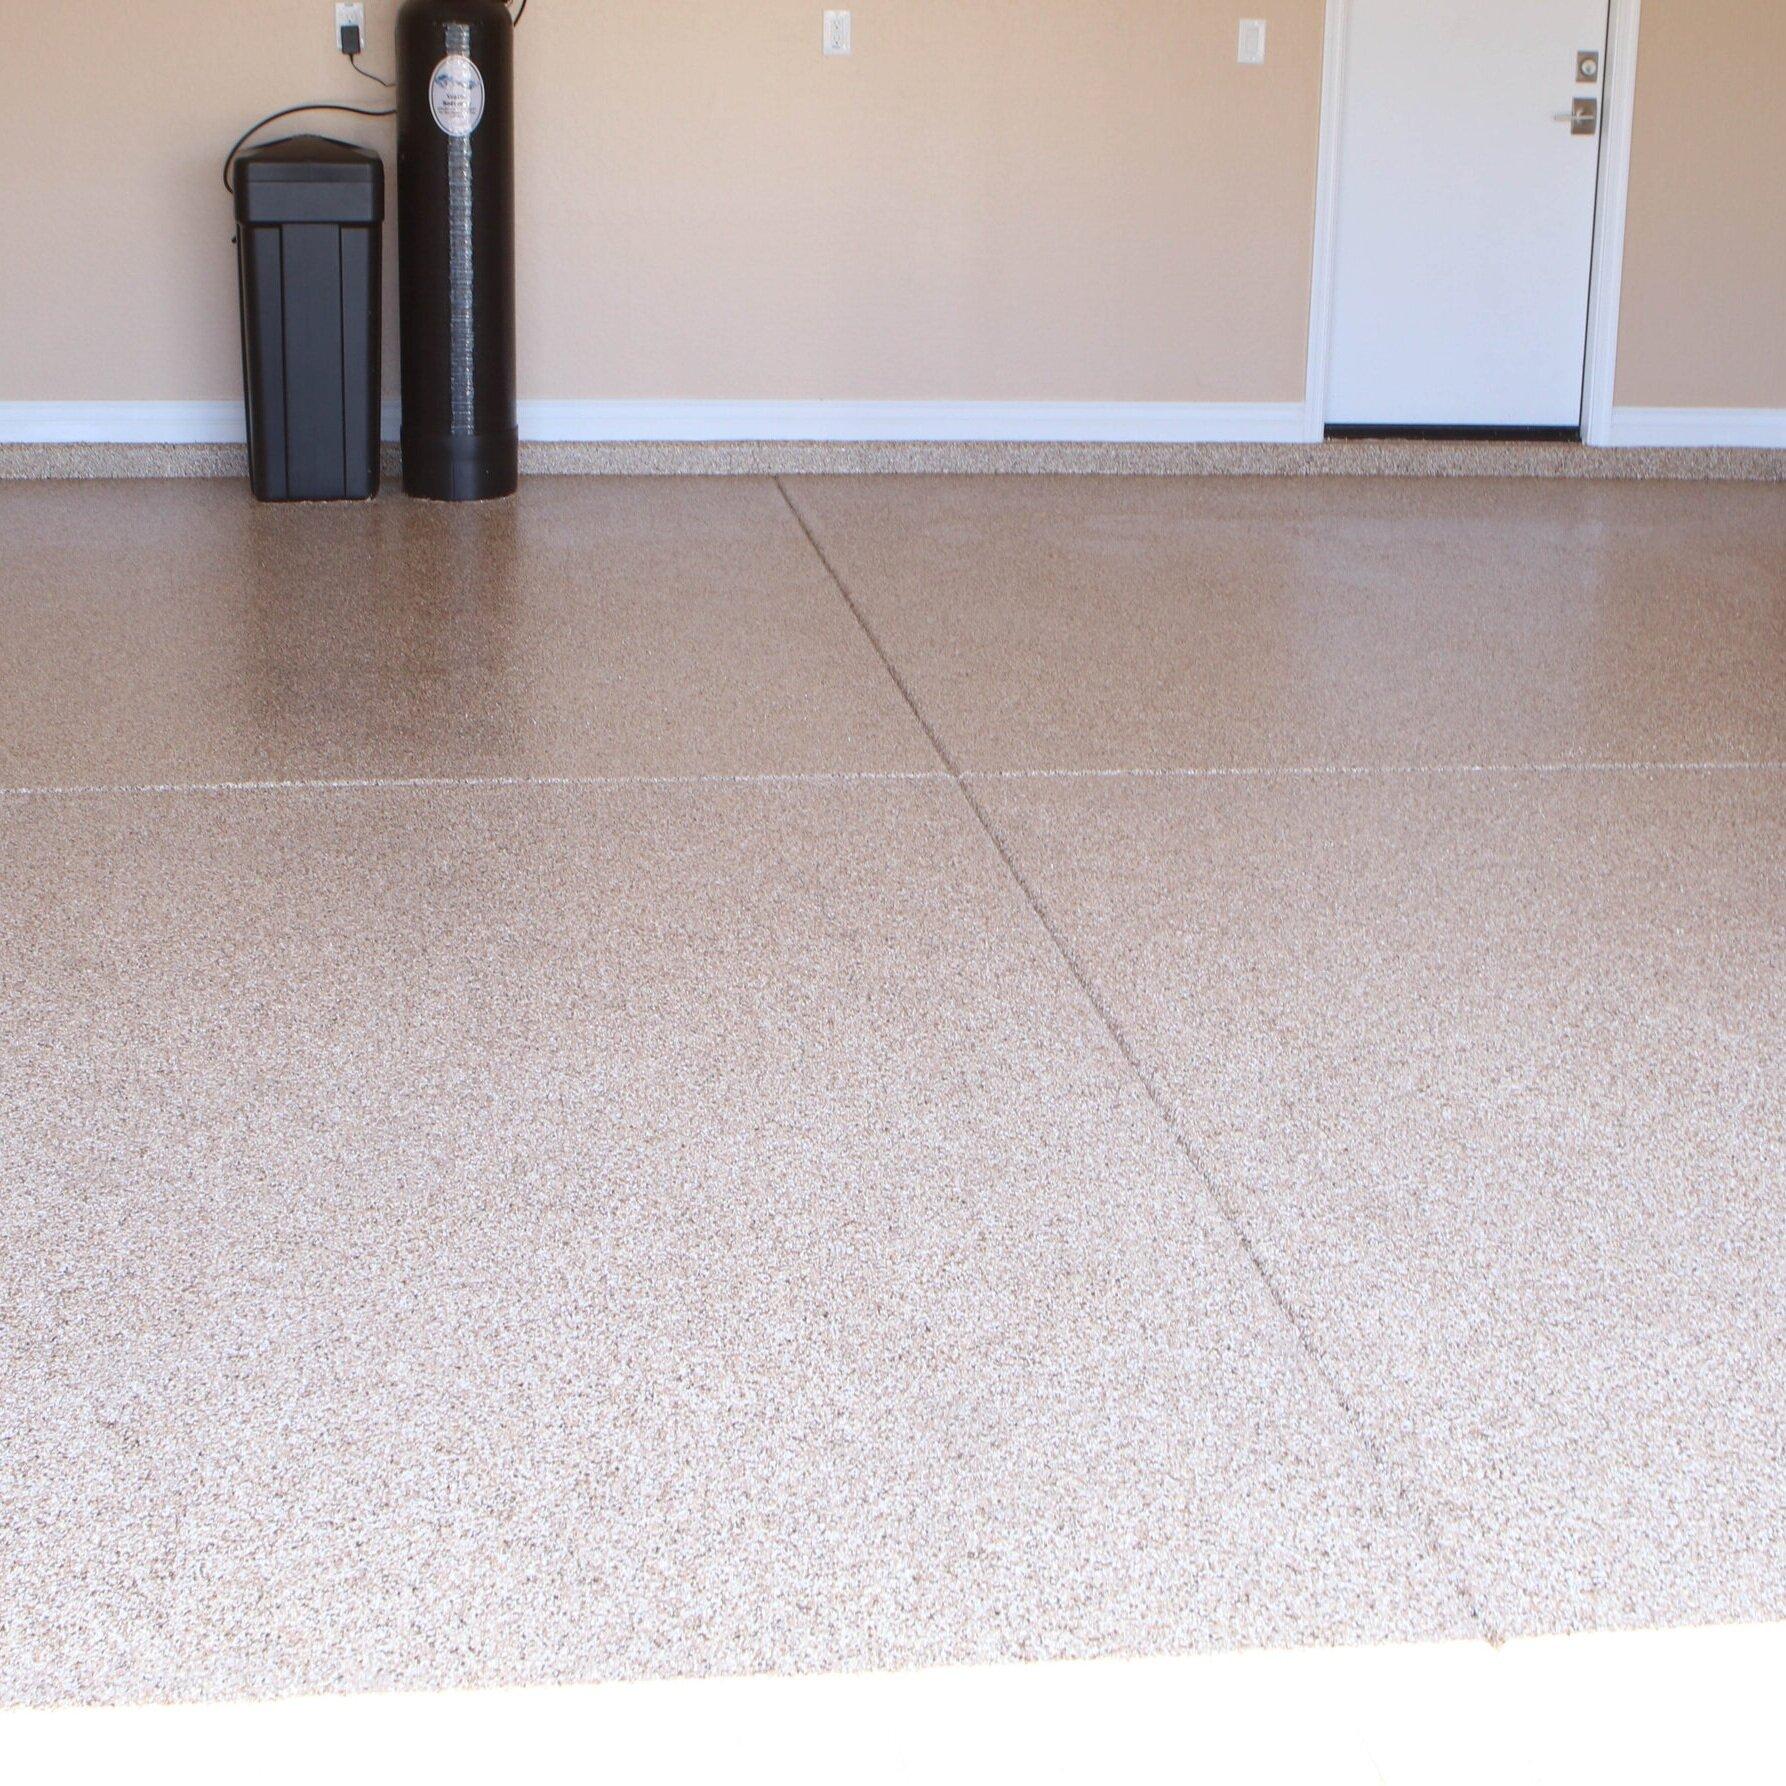 Keeping Epoxy Flooring Clean Is Easy Quick Response Garage Floor